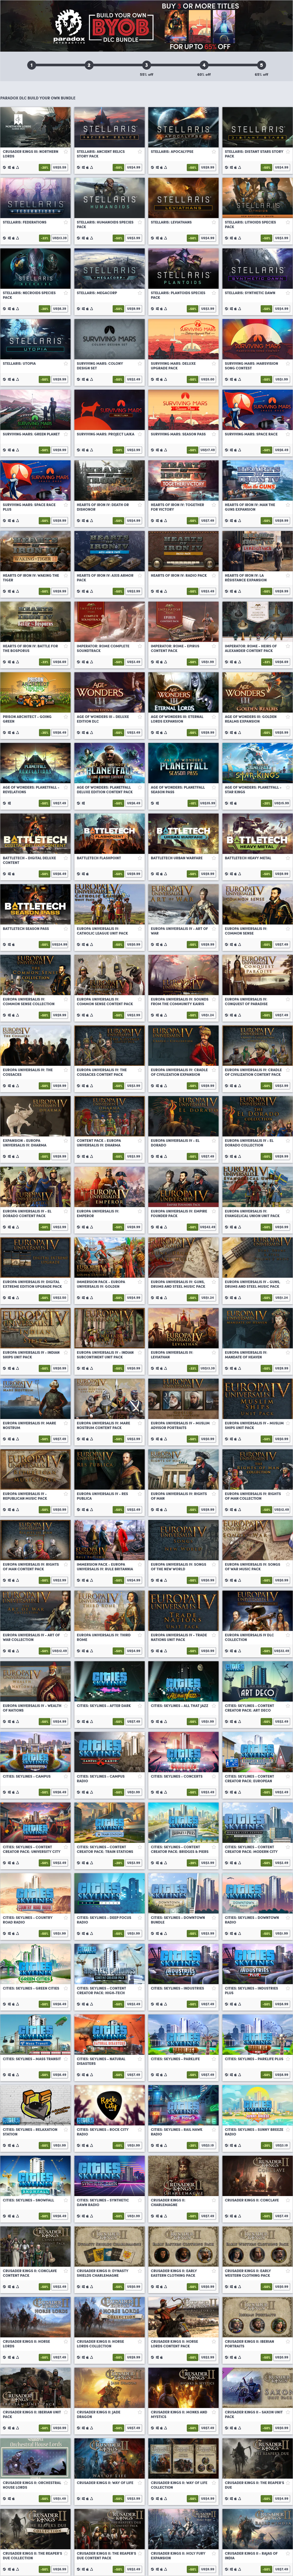 Screenshot 2021-10-12 at 16-44-27 Paradox DLC Build Your Own Bundle Humble Store.png